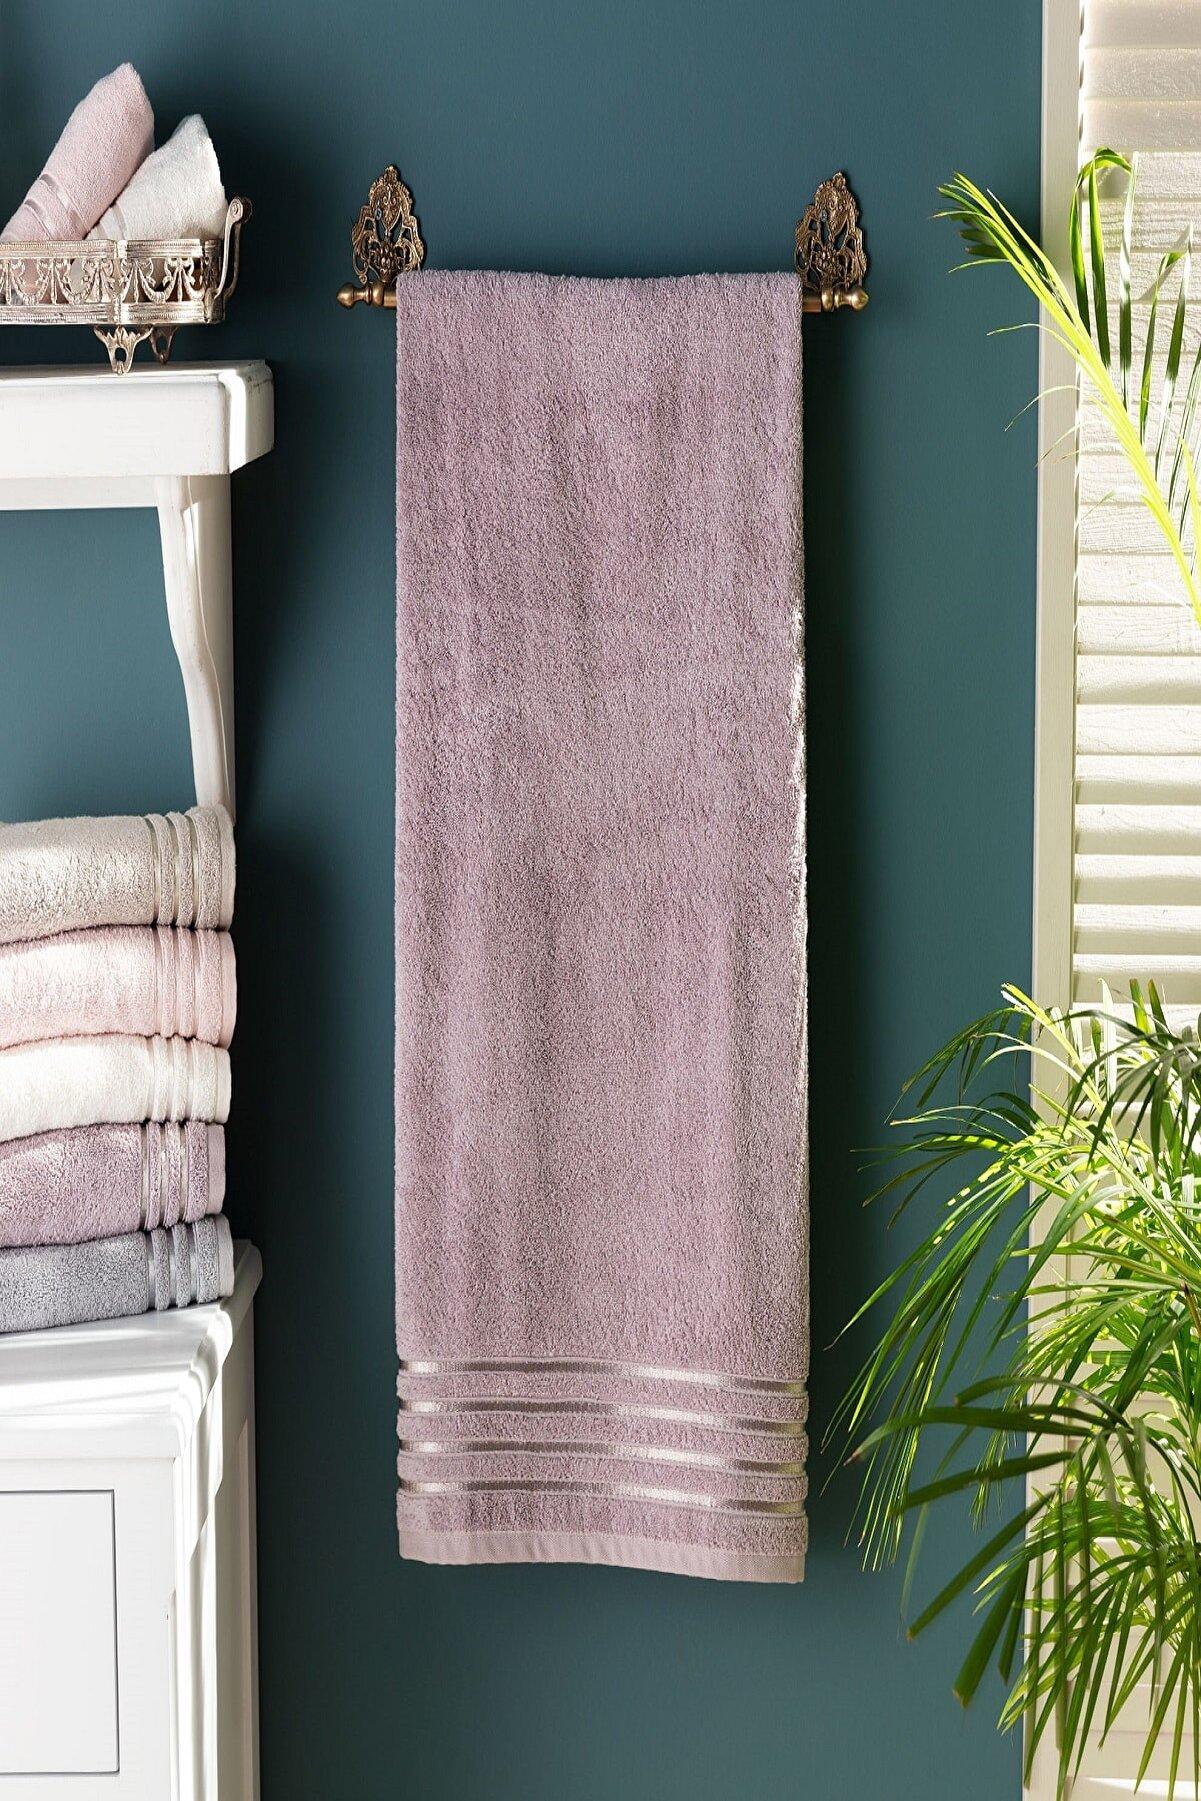 Madame Coco Maynor Bordürü Floşlu Banyo Havlusu - Açık Mürdüm - 70x140 Cm